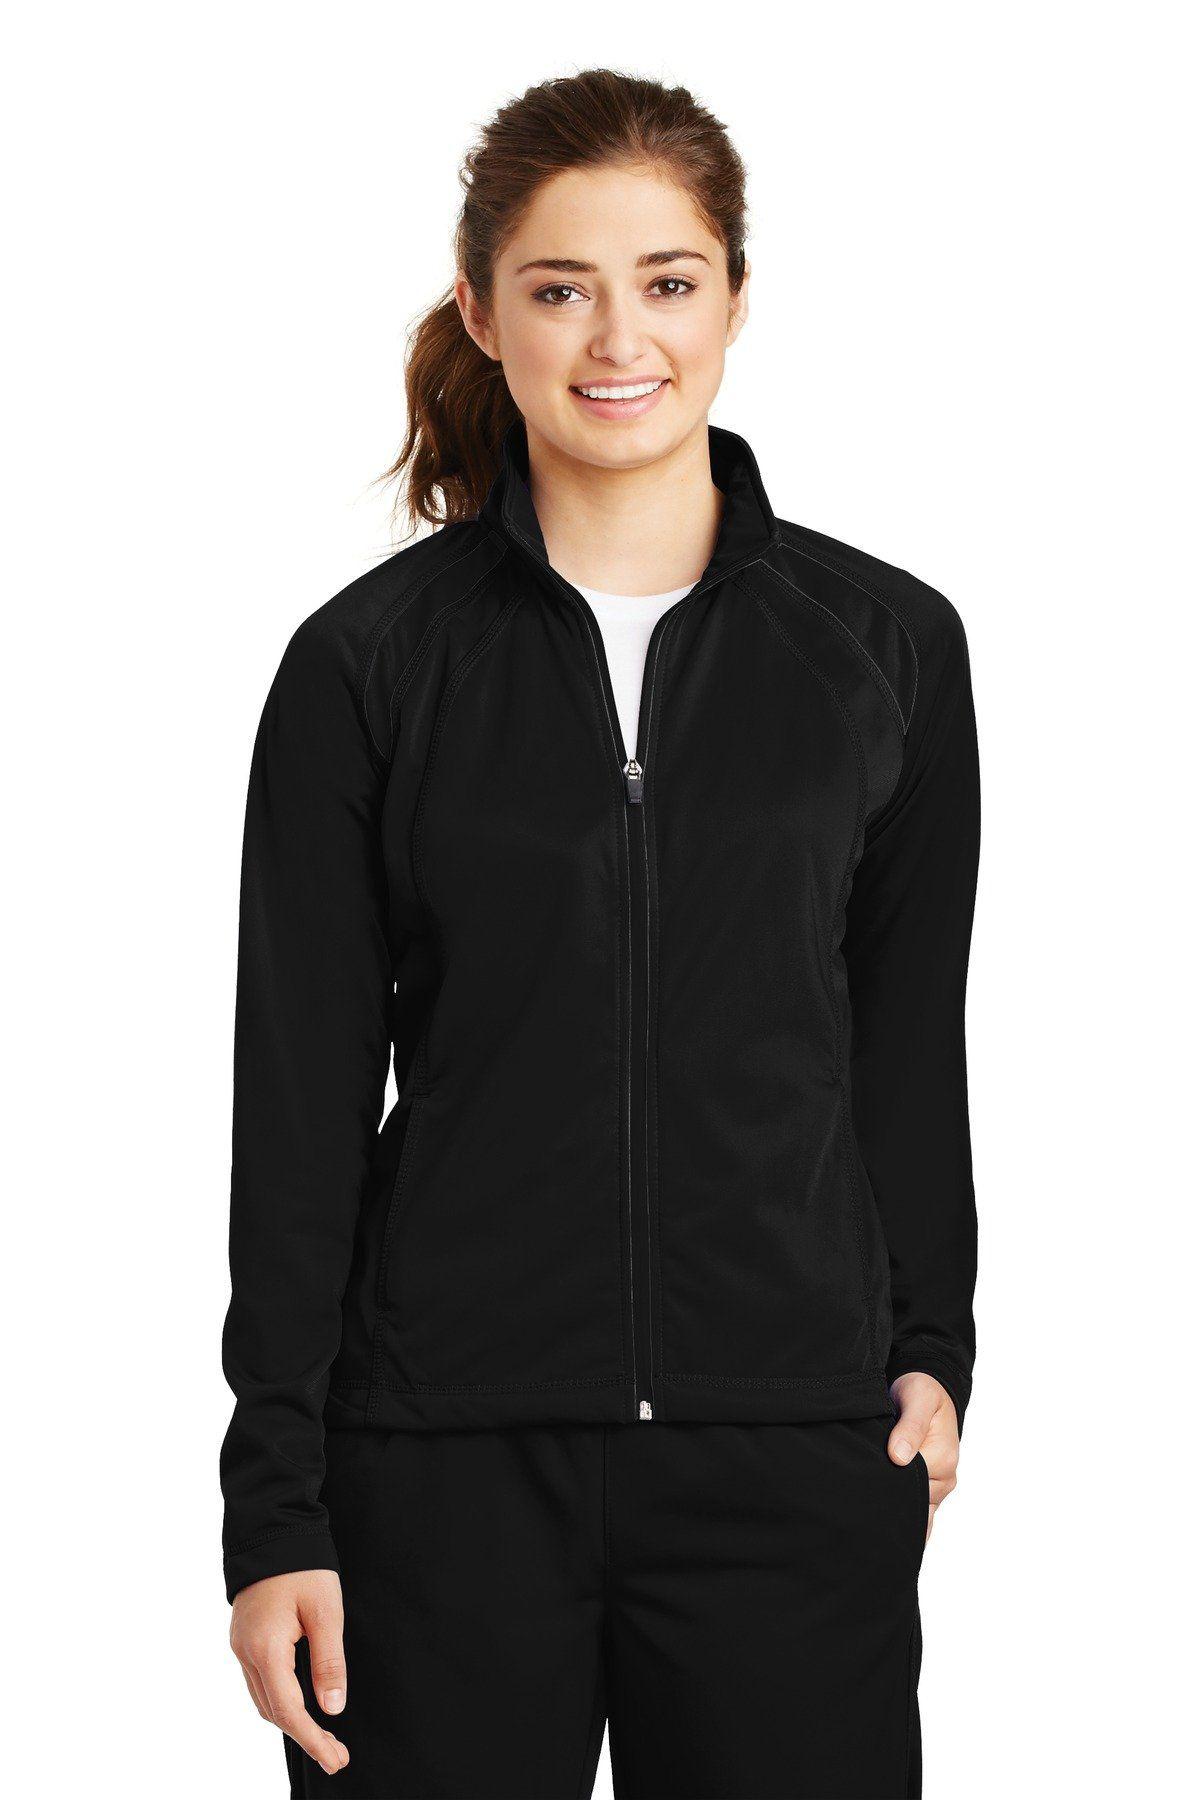 SportTek Ladies Tricot Track Jacket LST90 Black/Black